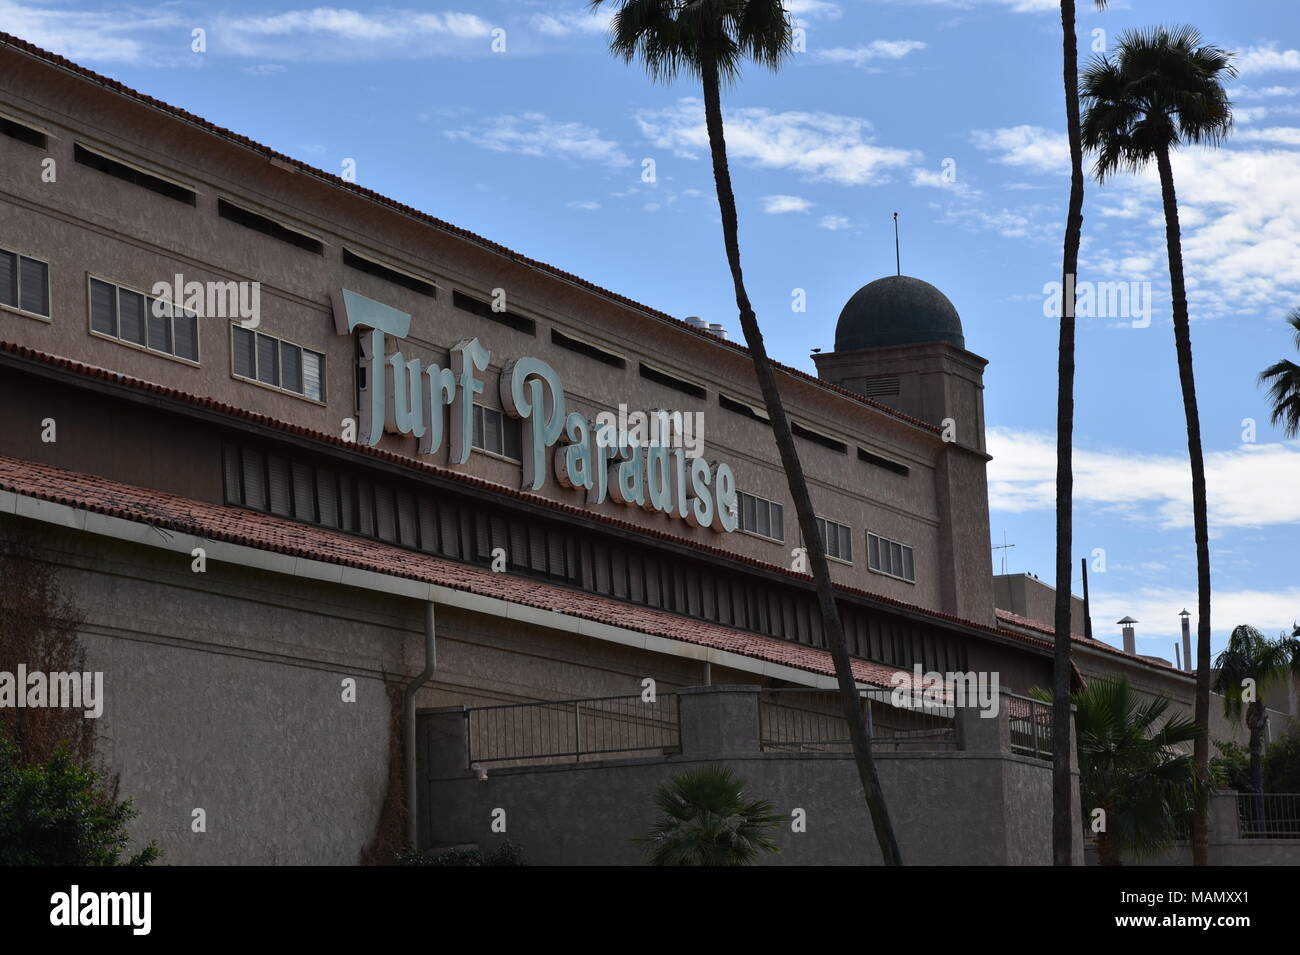 Turf Paradise Horse Race track in Phoenix Arizona 4/1/18 Stock Photo